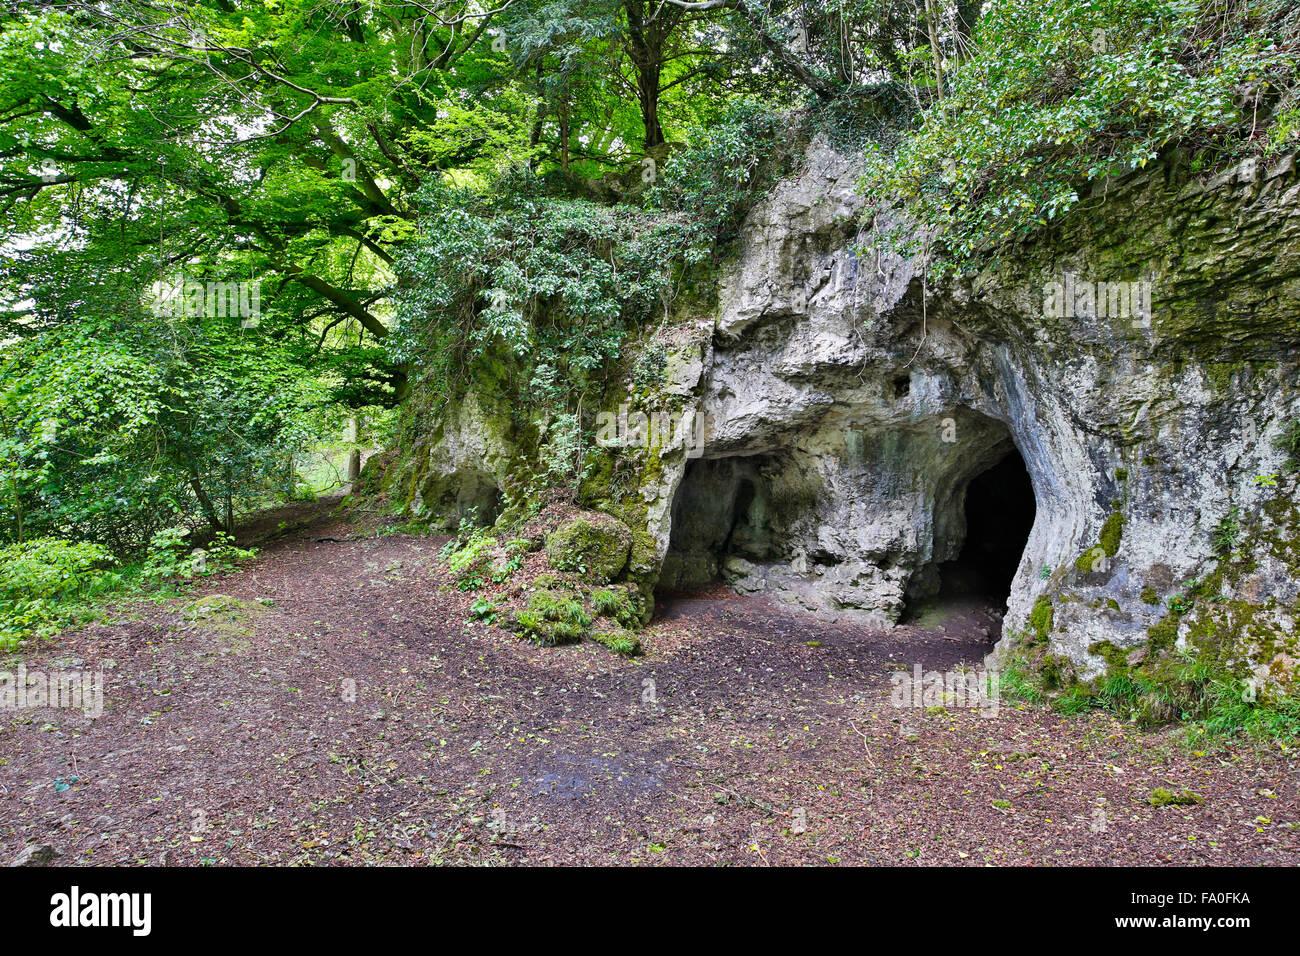 King Arthur's Cave; Herefordshire Wildlife Trust Reserve; The Doward; Herefordshire; UK - Stock Image